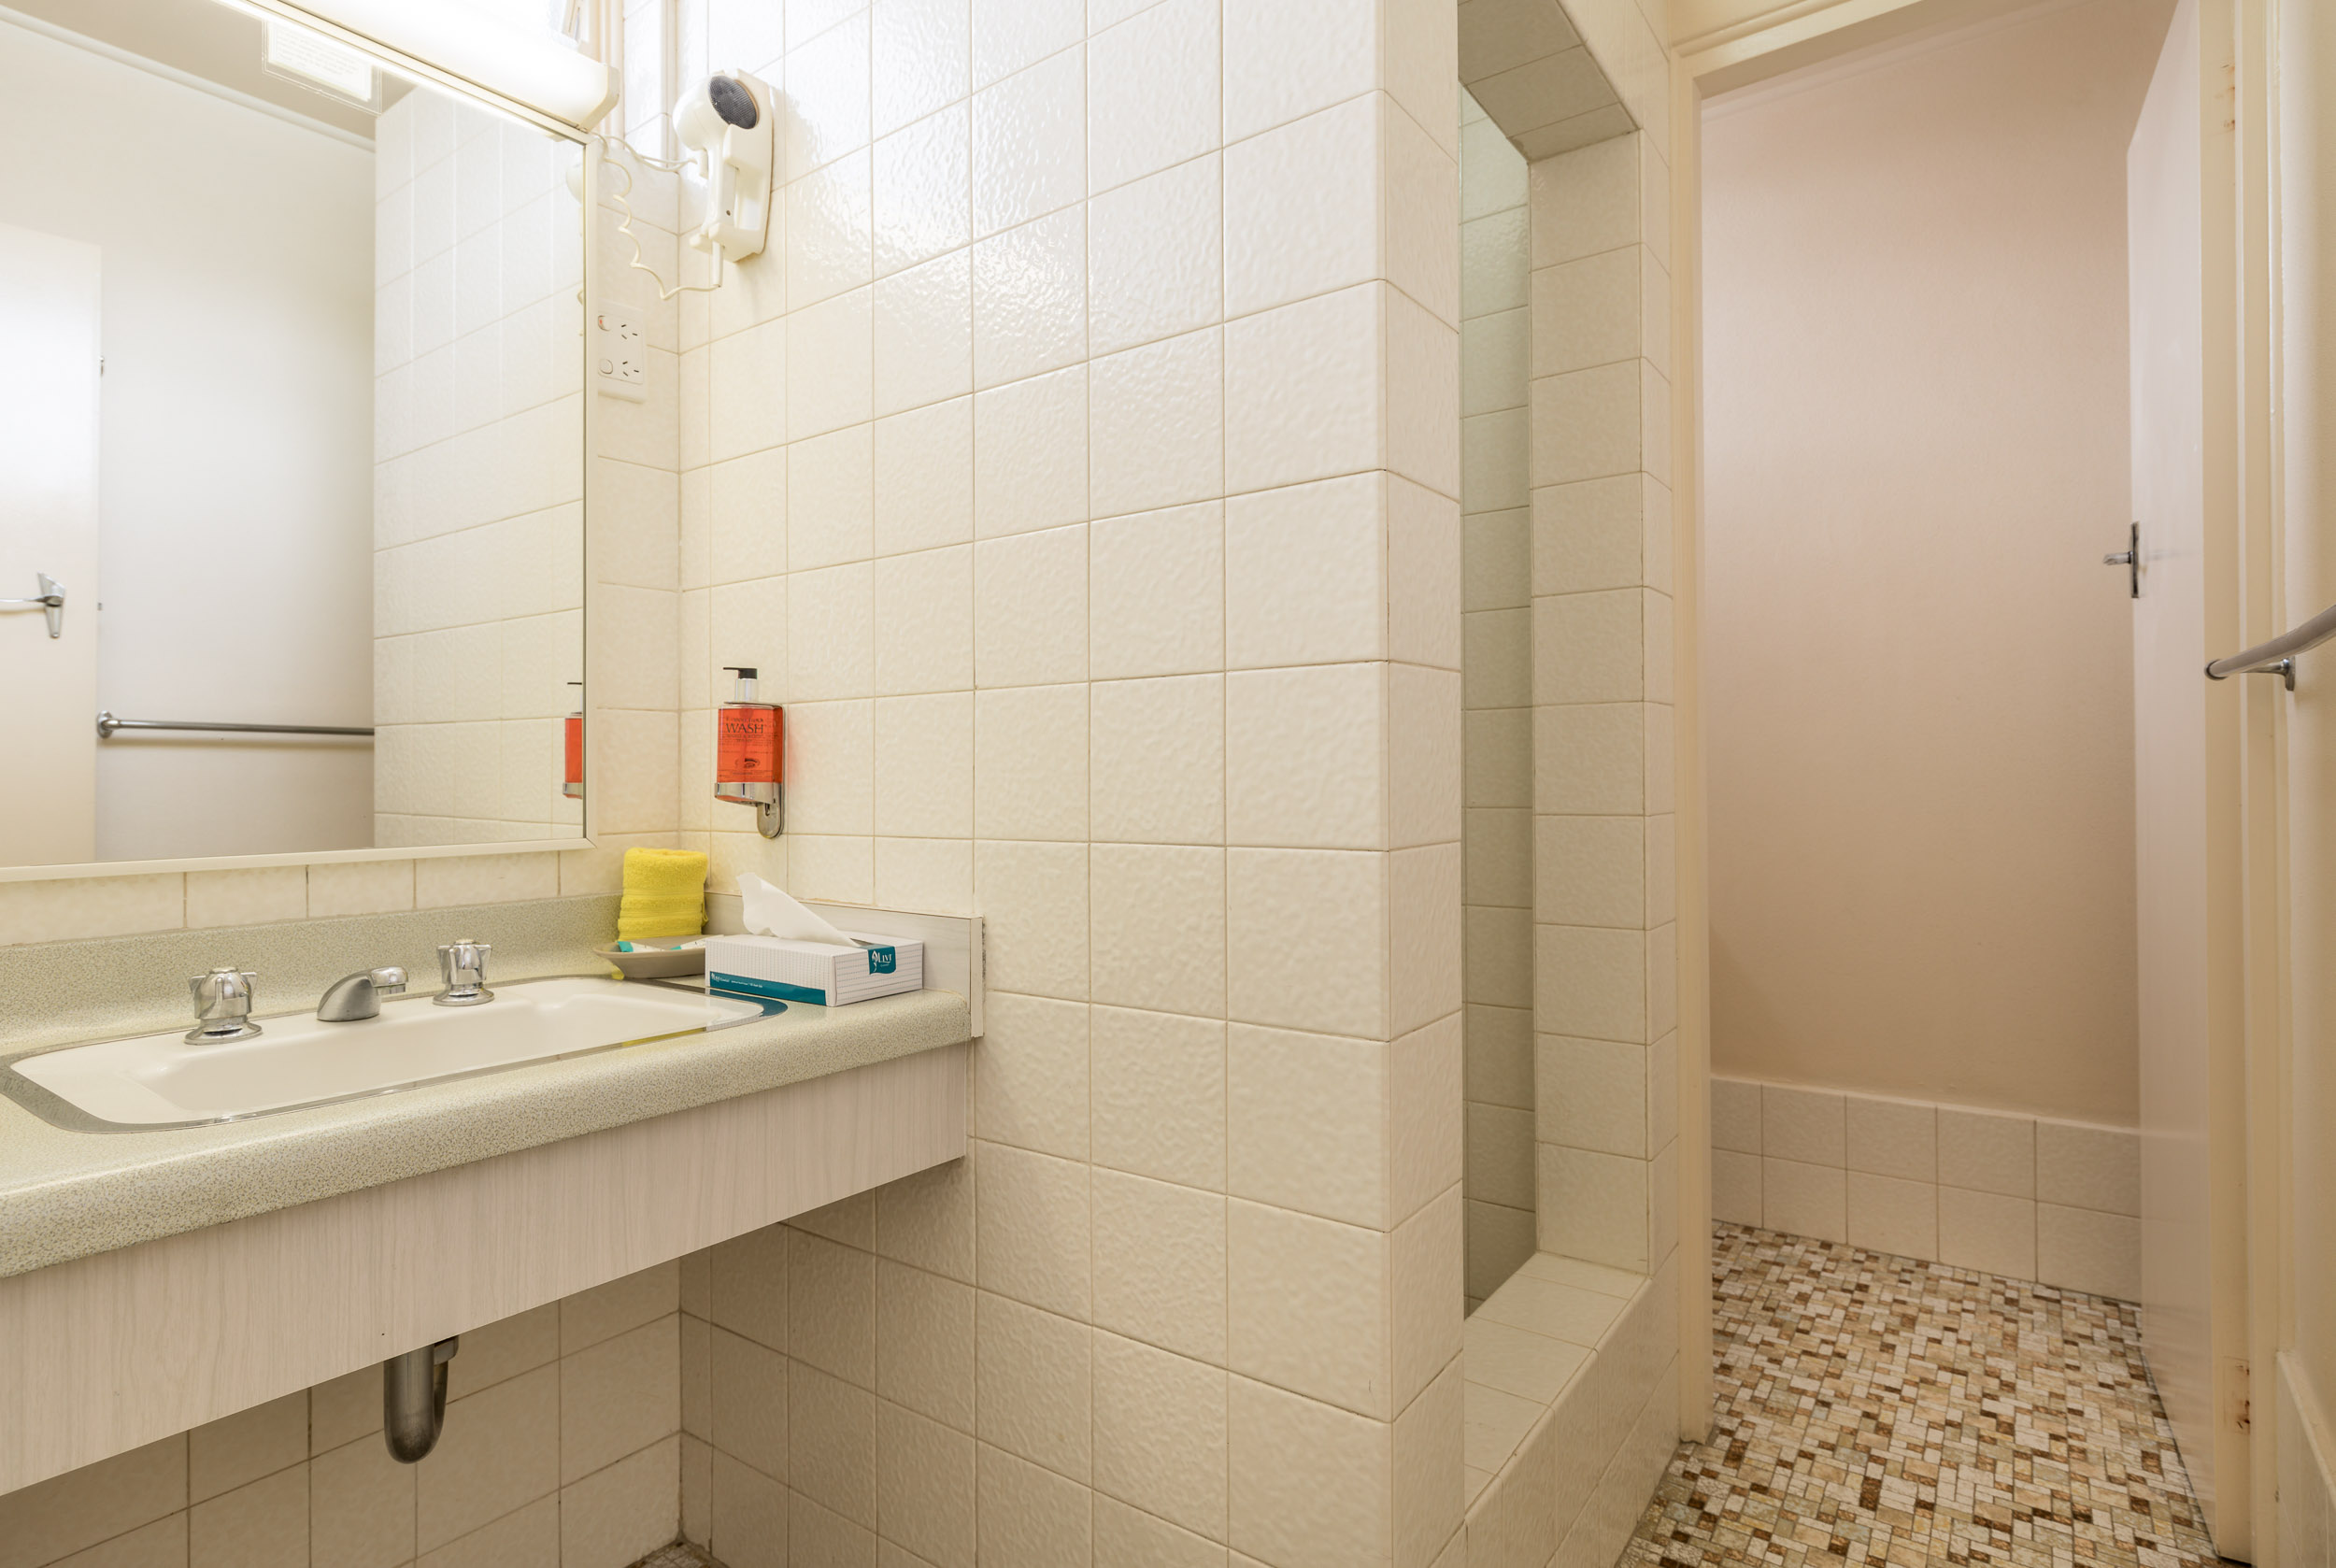 Separate Toile, Bathroom & Toiletiries